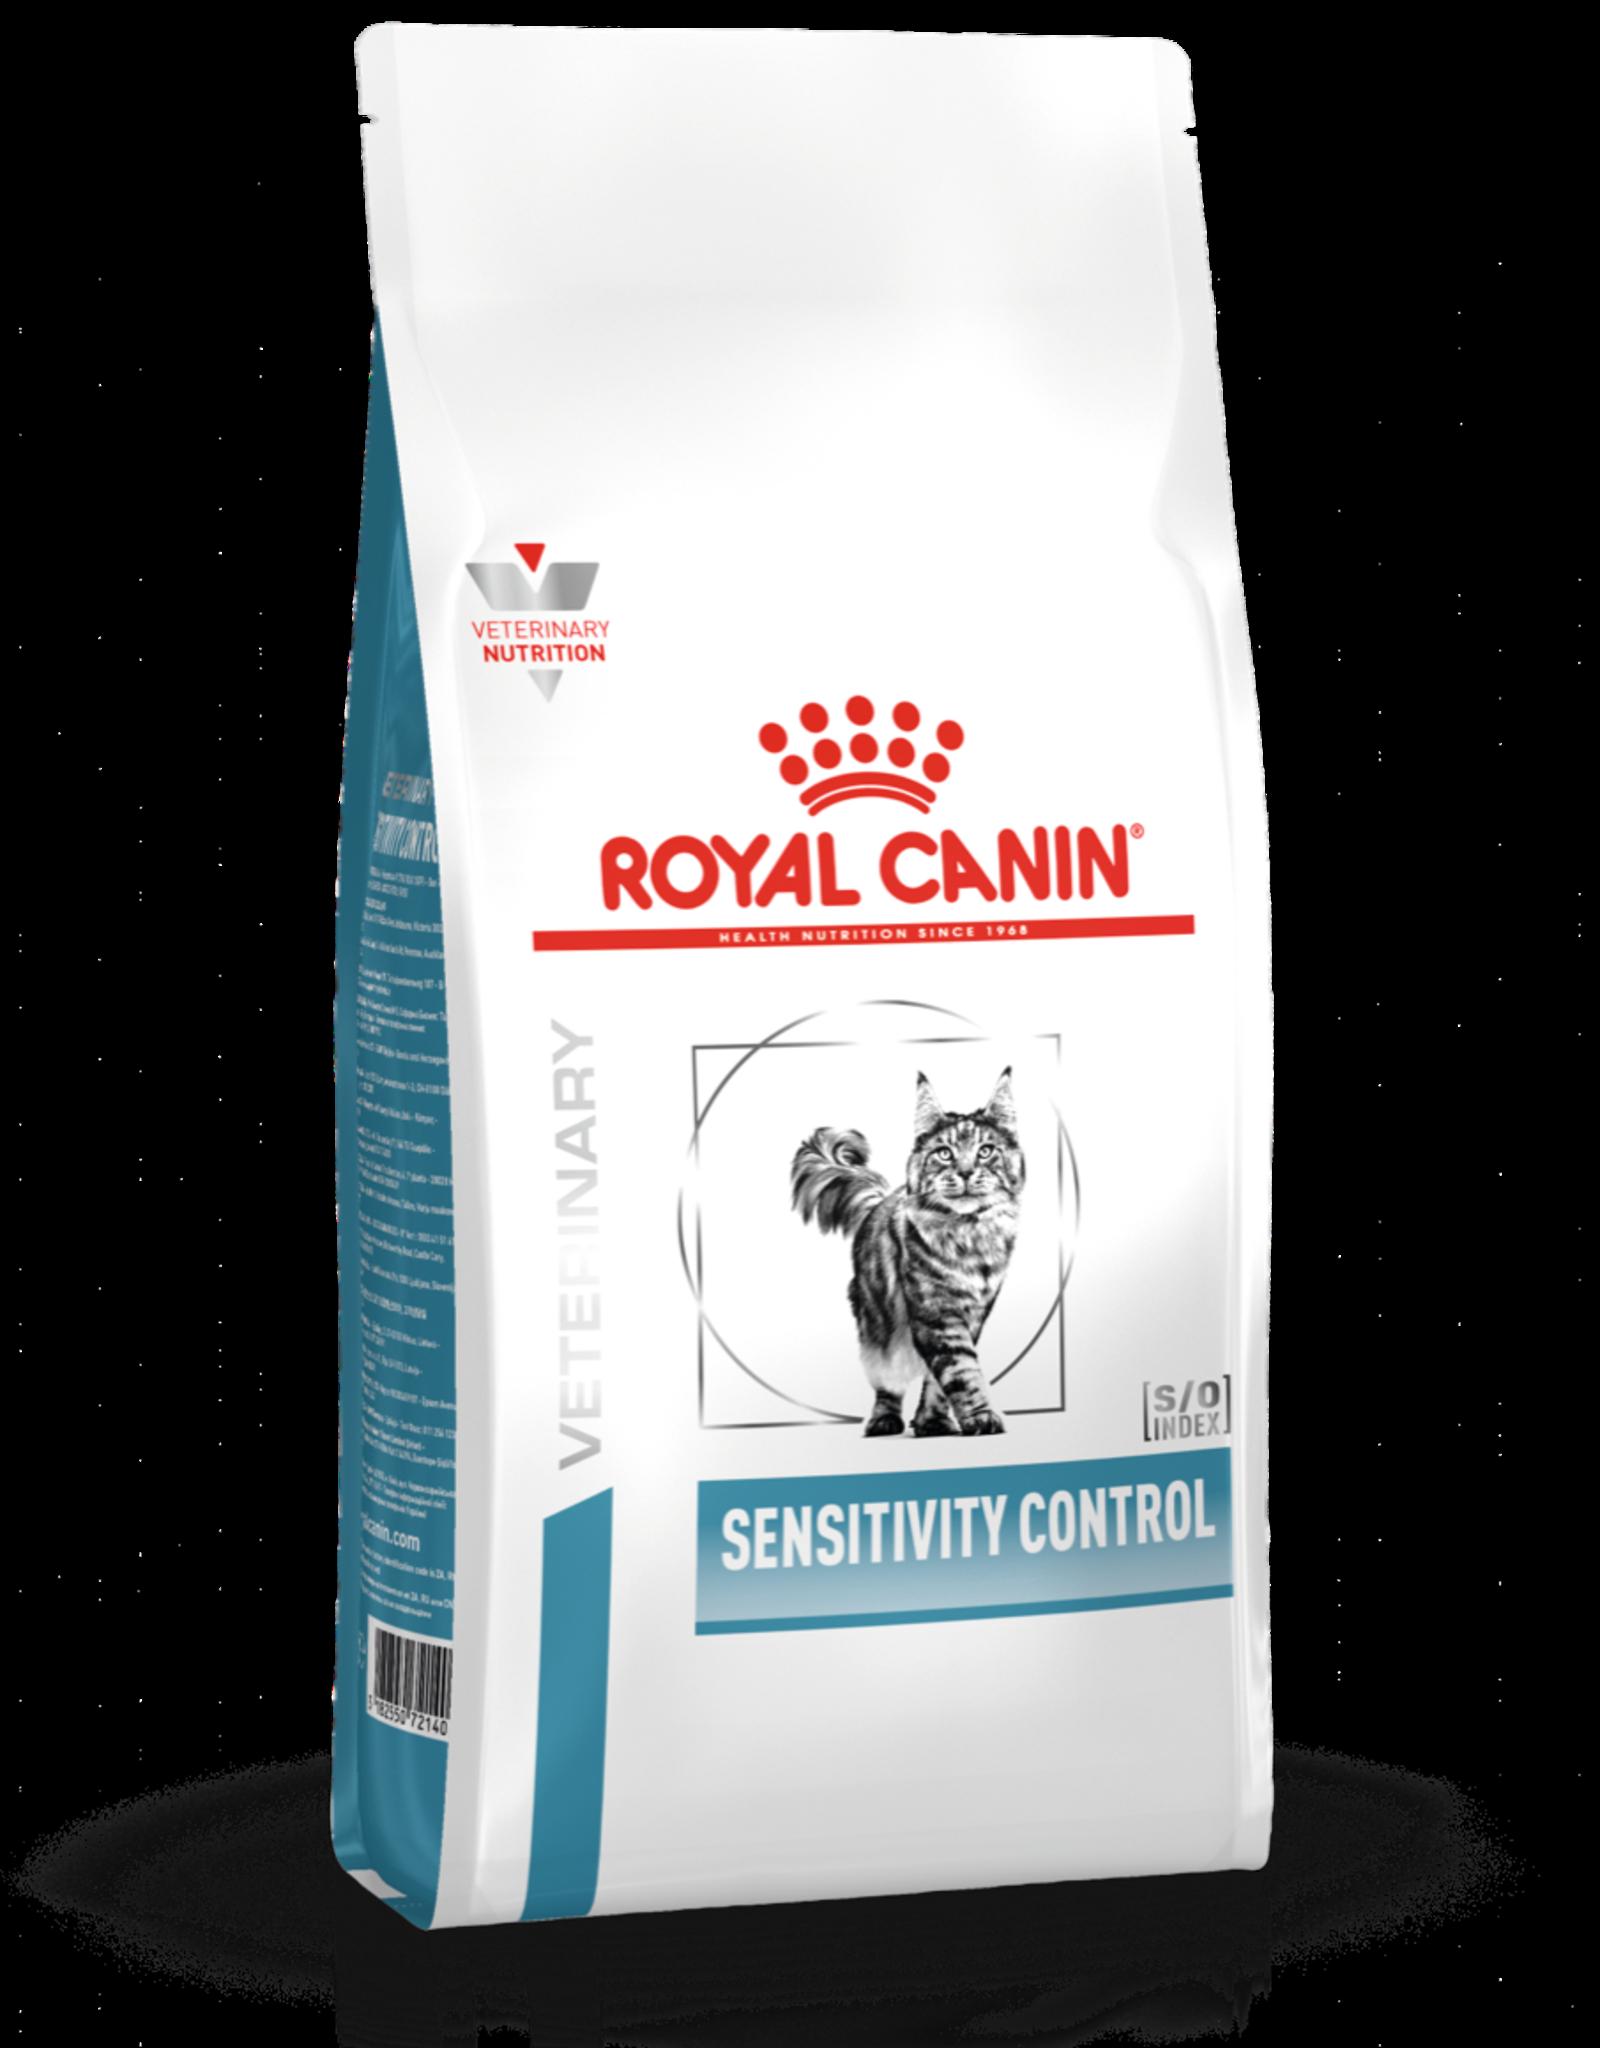 Royal Canin Royal Canin Sensitivityy Control Katze Ente 3,5kg